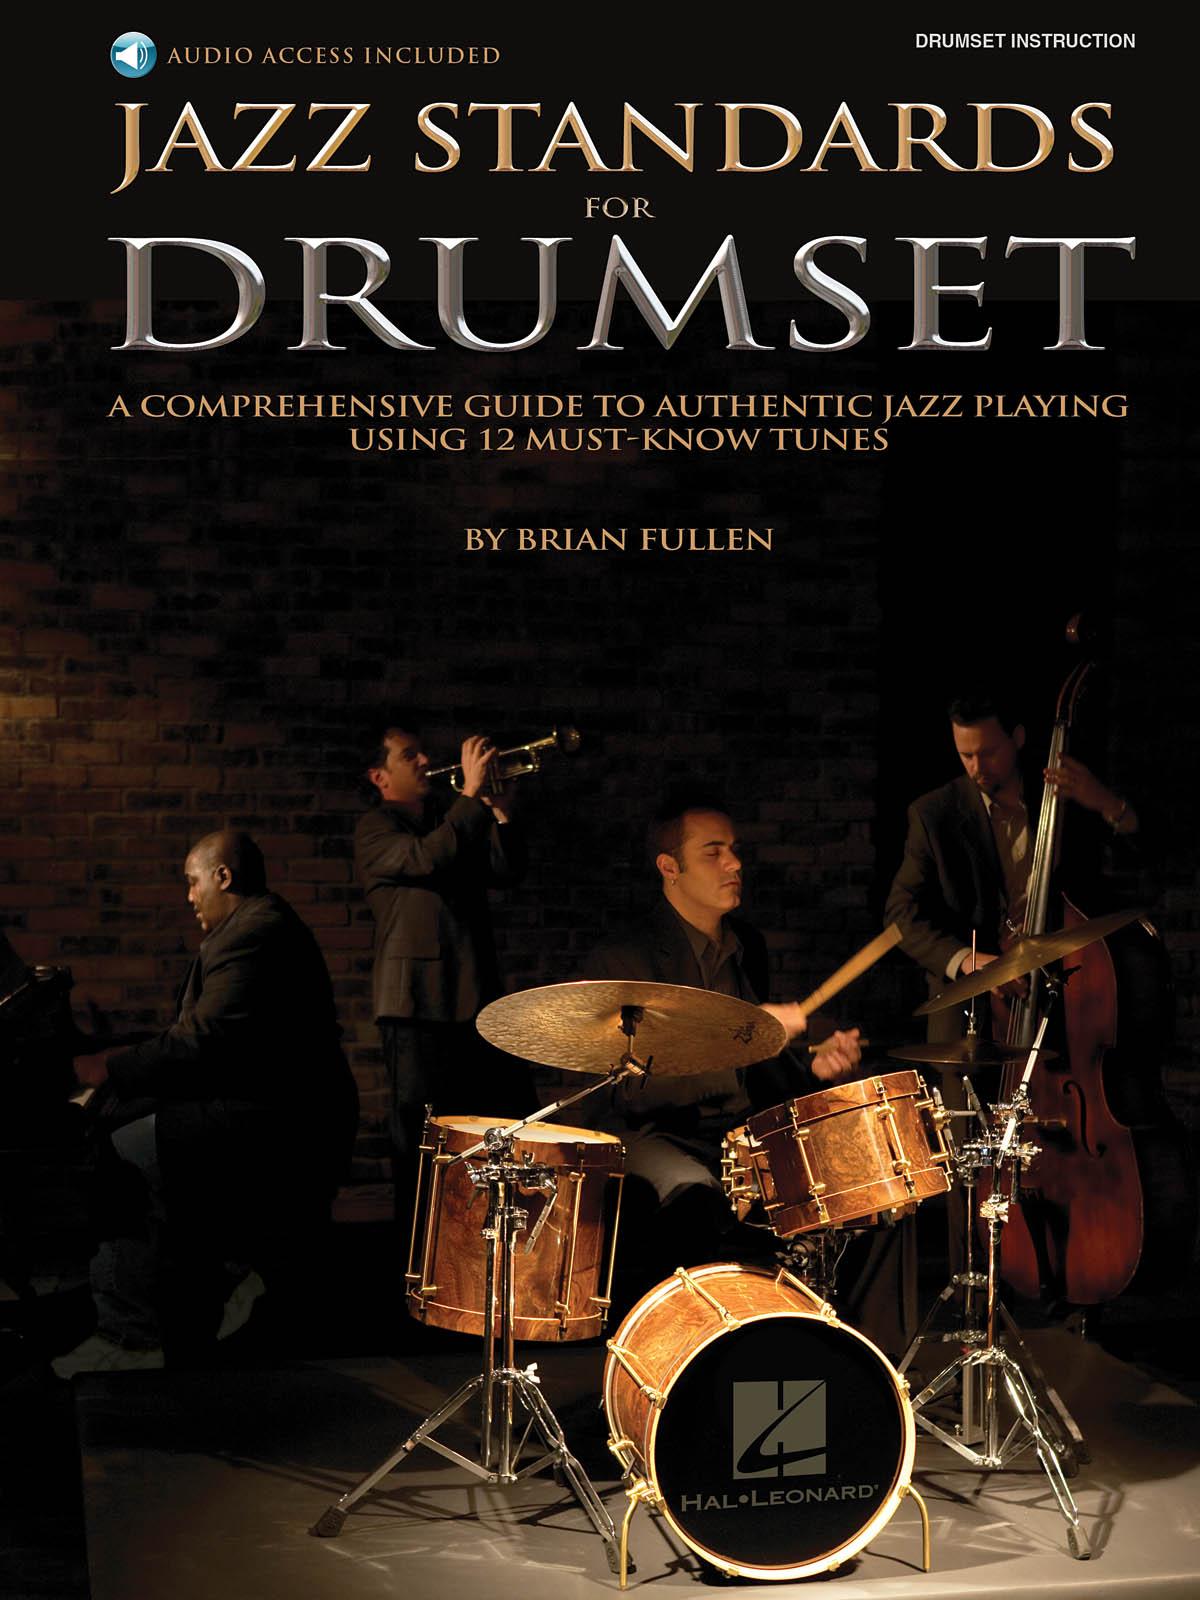 Jazz Standards for Drumset